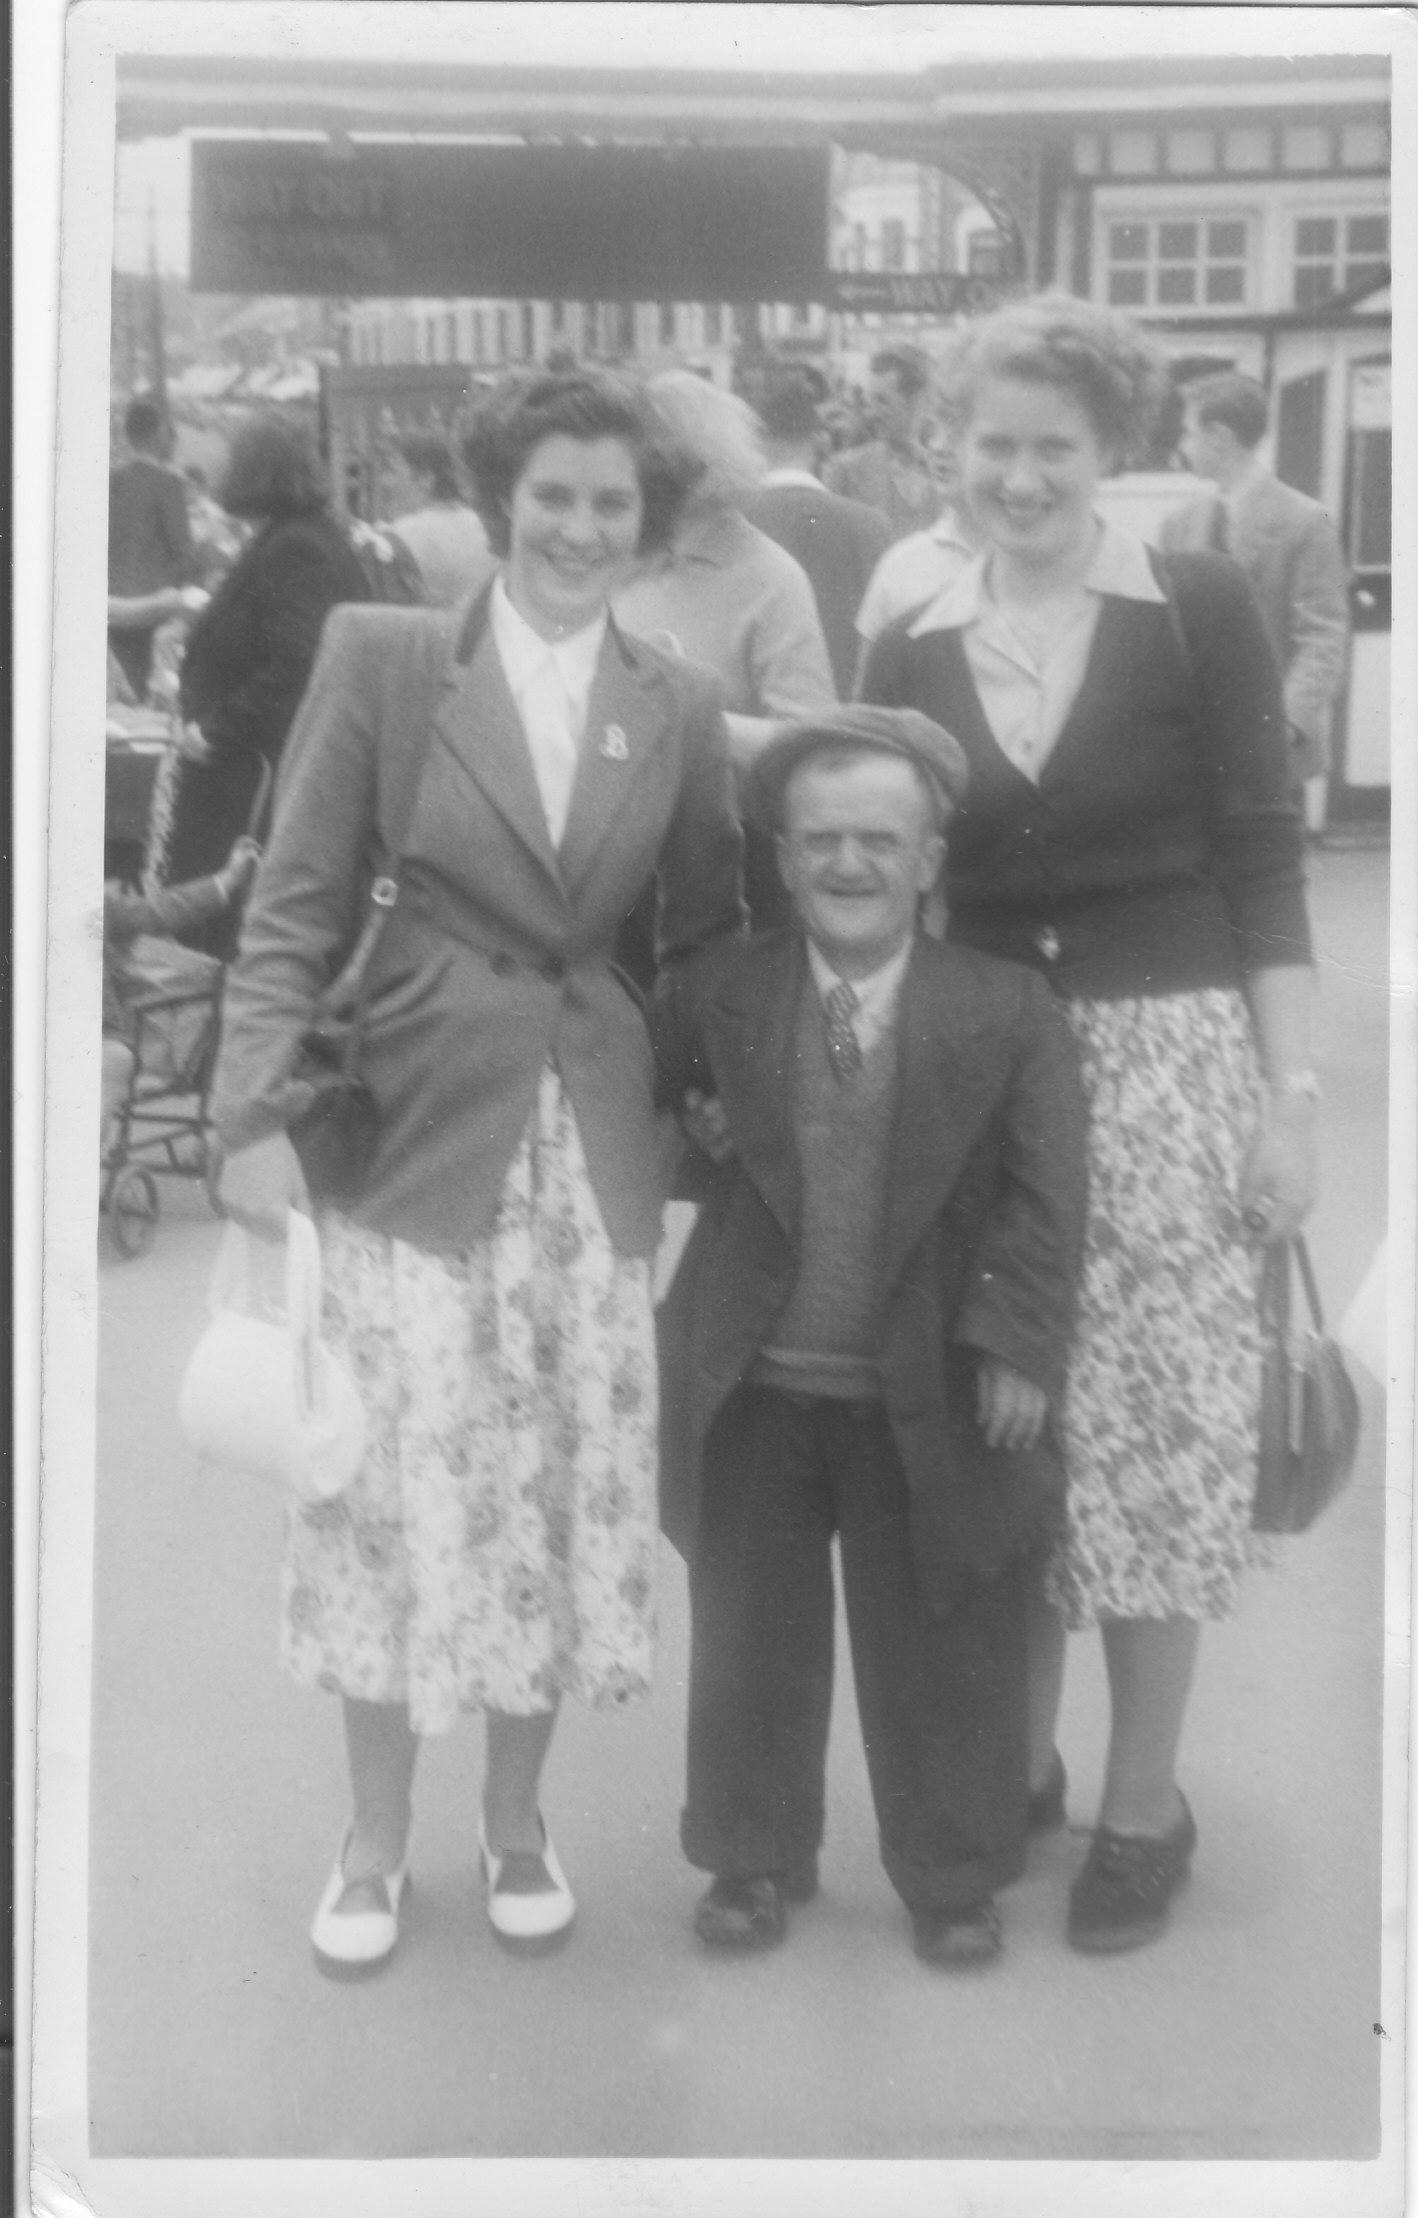 Gressenhall photos - Beryl Hammond, Little Freddie, Gladys Richmond jpg (1418px x 2218px)